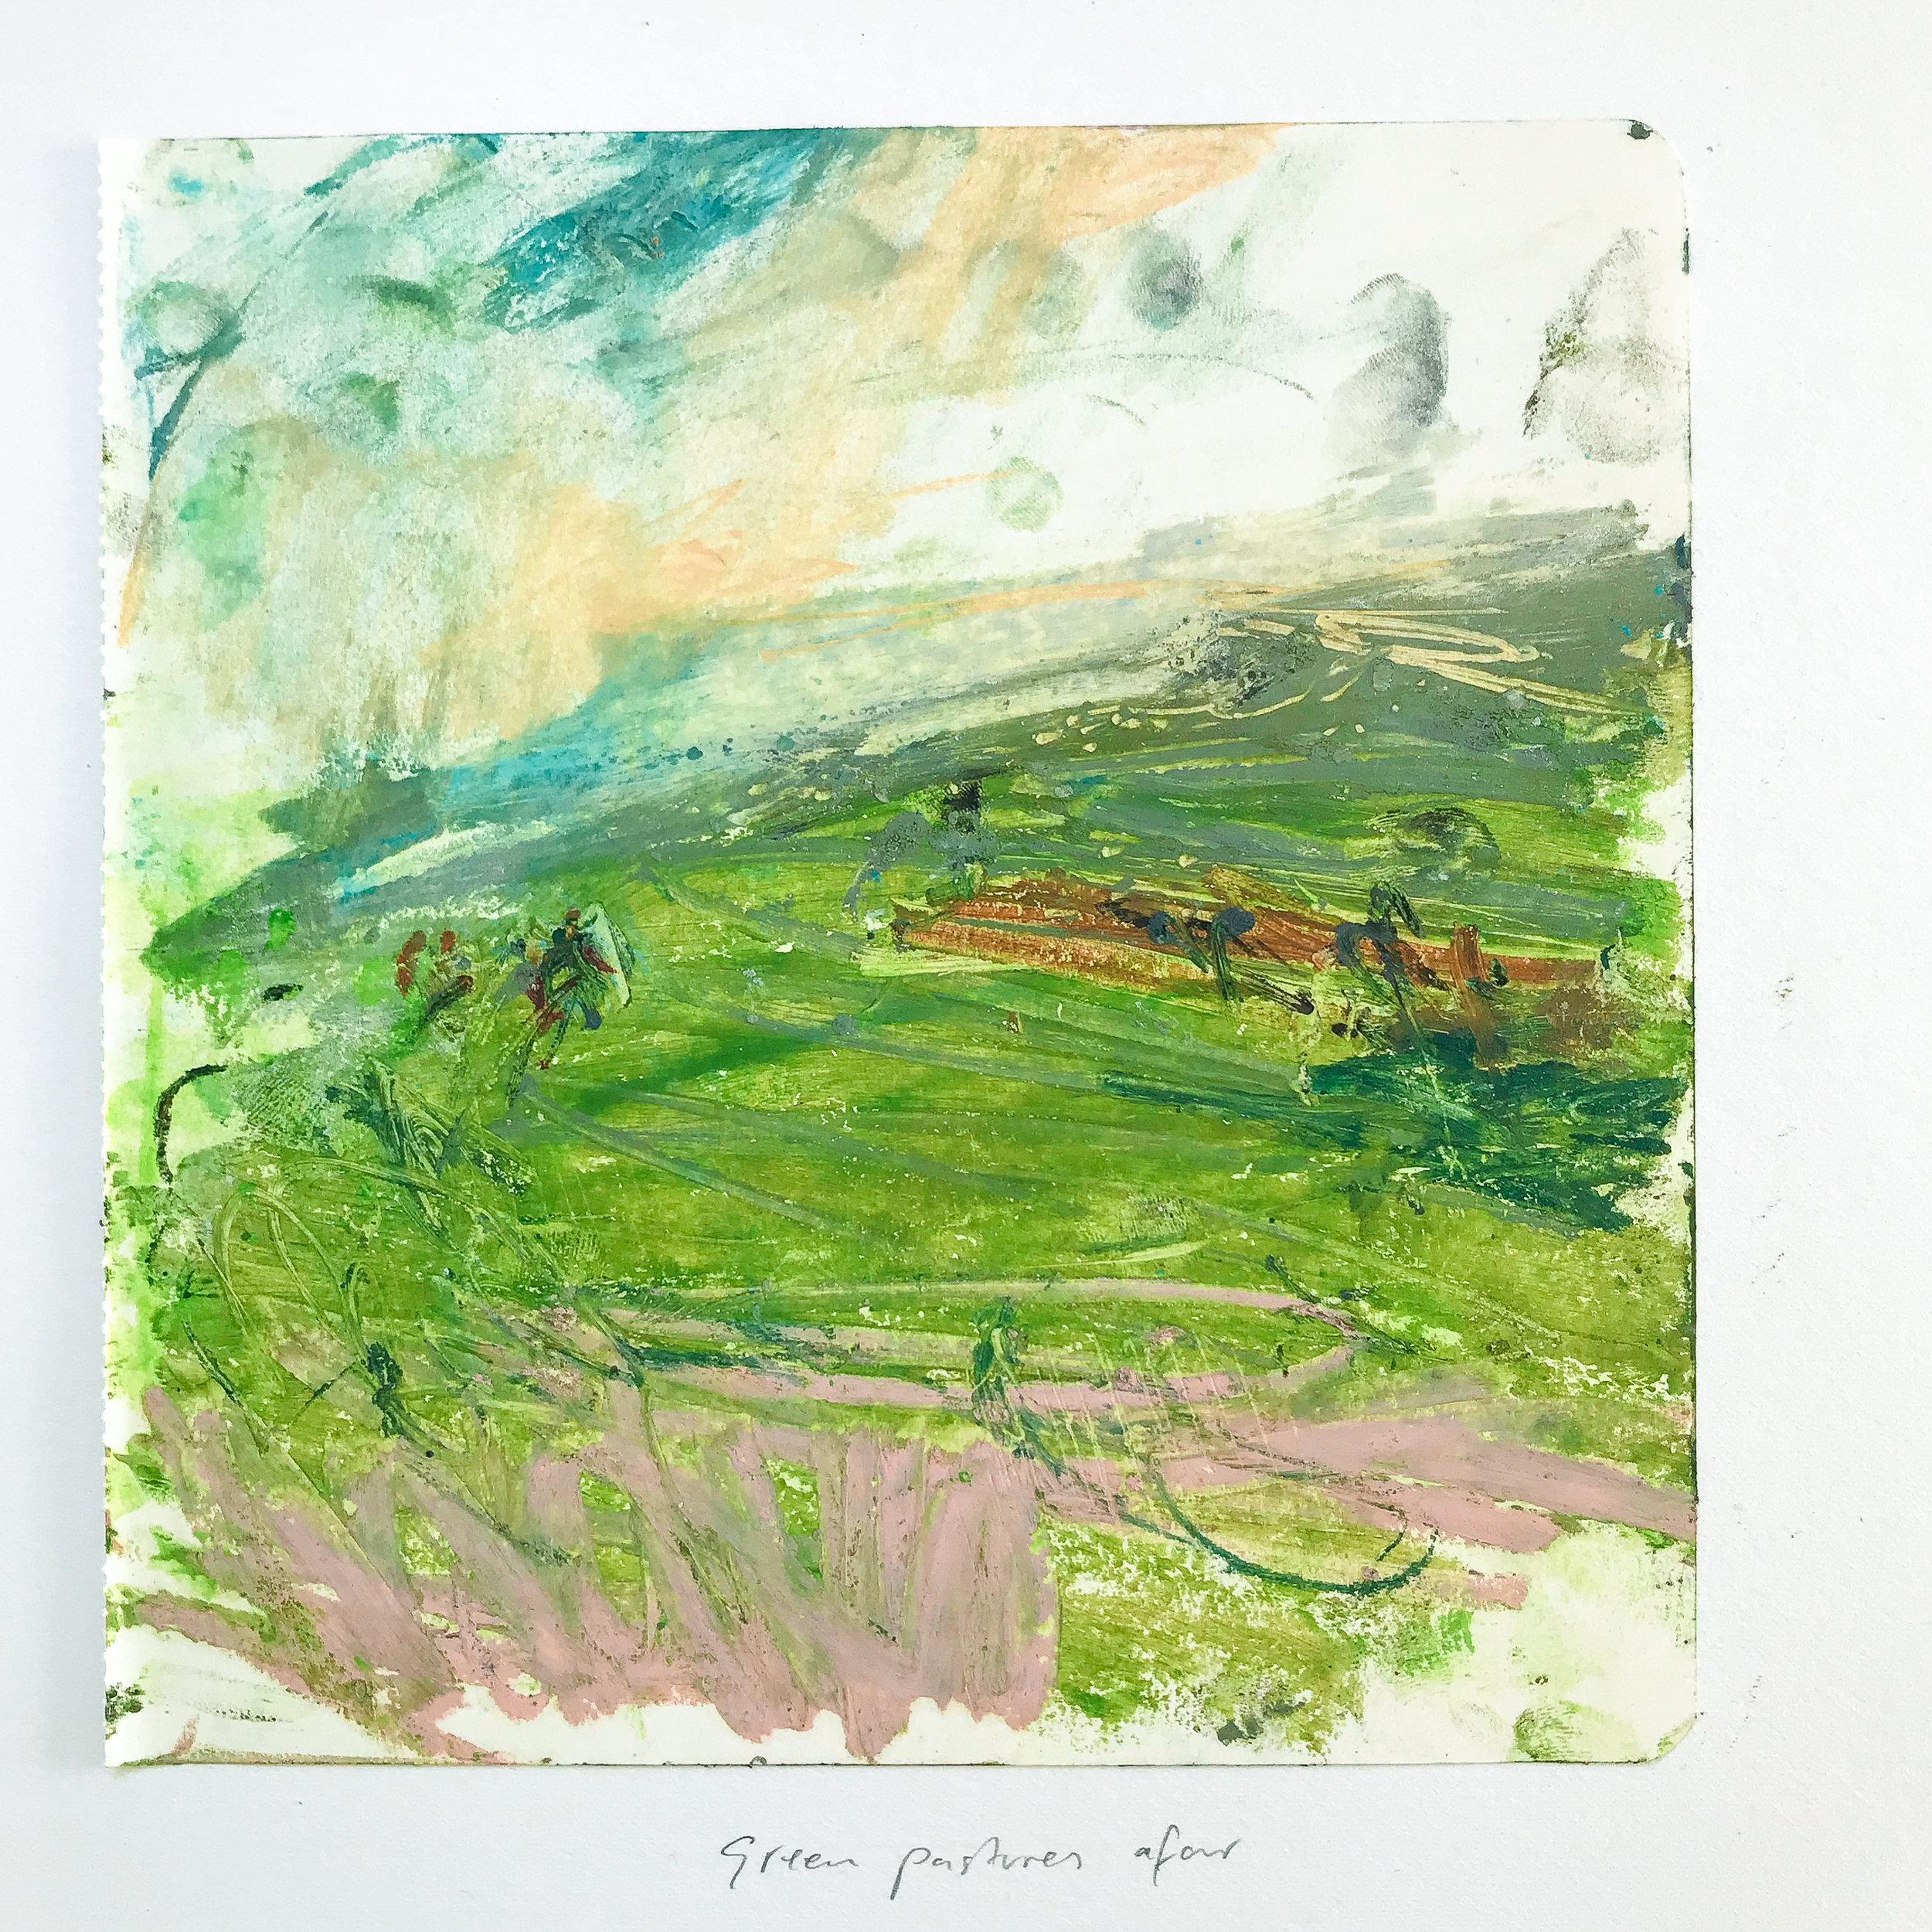 Green Pastures Afar-2.jpg